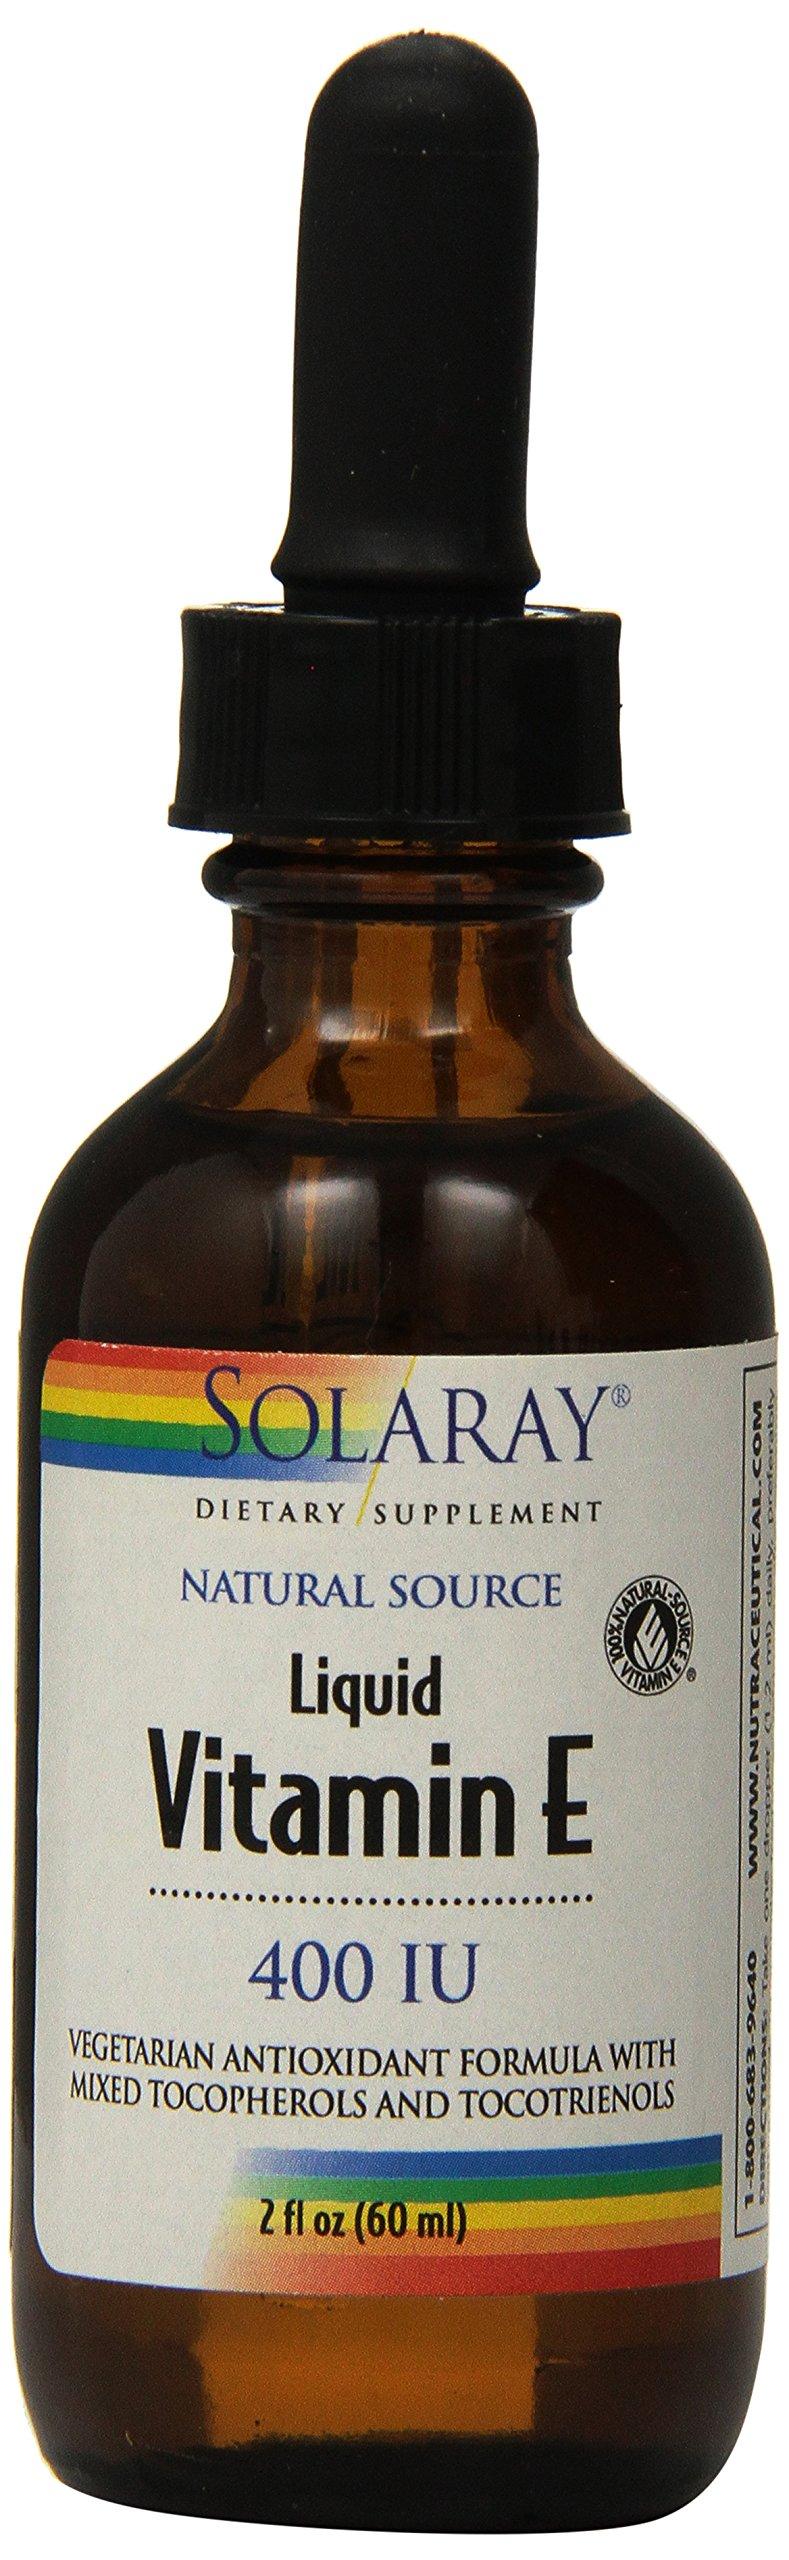 Solaray Liquid Vitamin E 400 IU Supplement, 2 Fluid Ounce